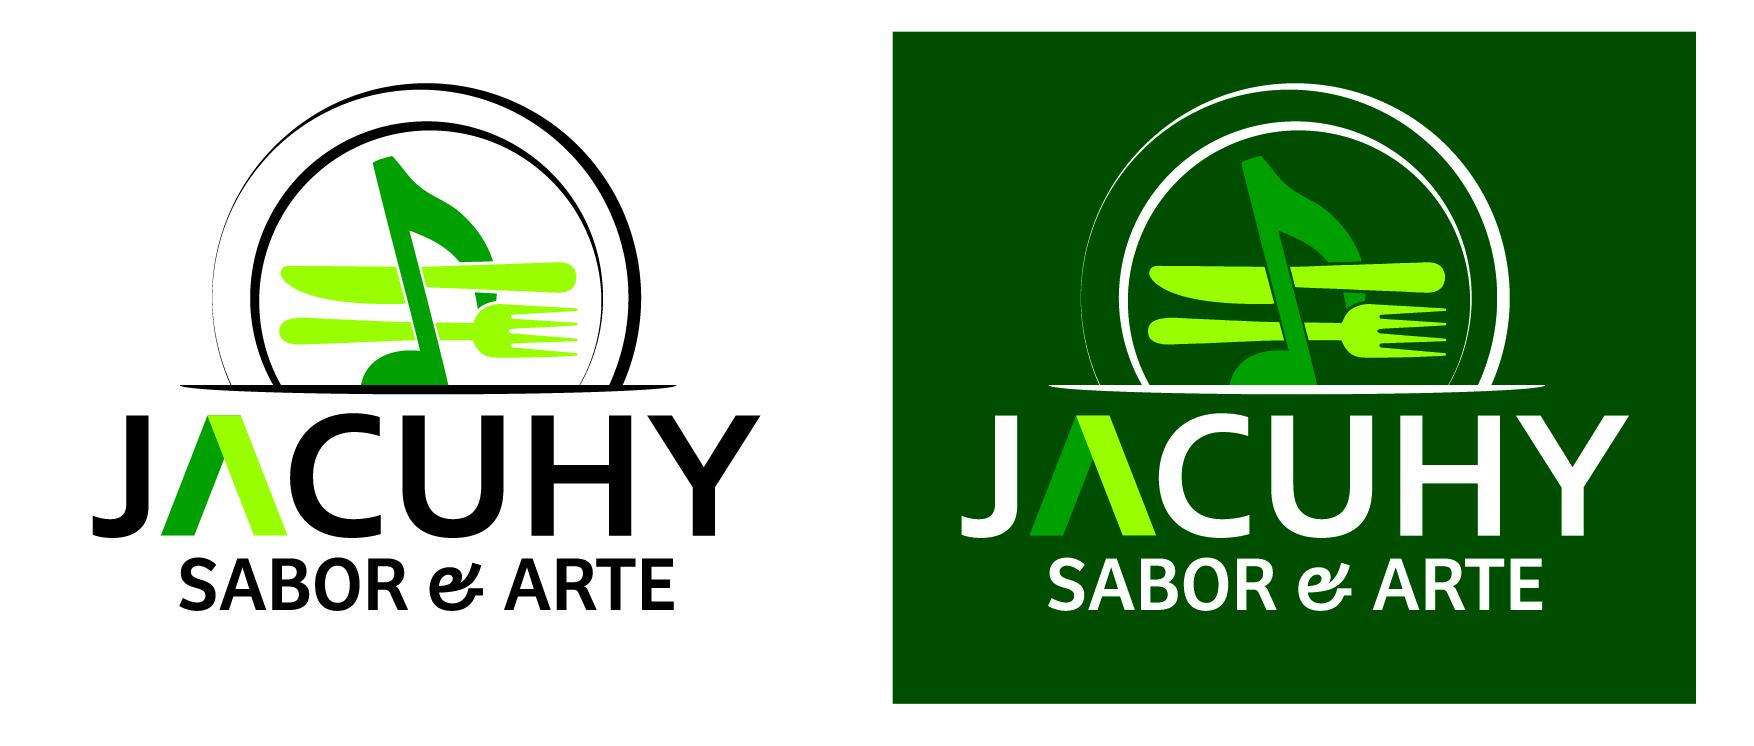 Projeto Jacuhy Sabor e Arte